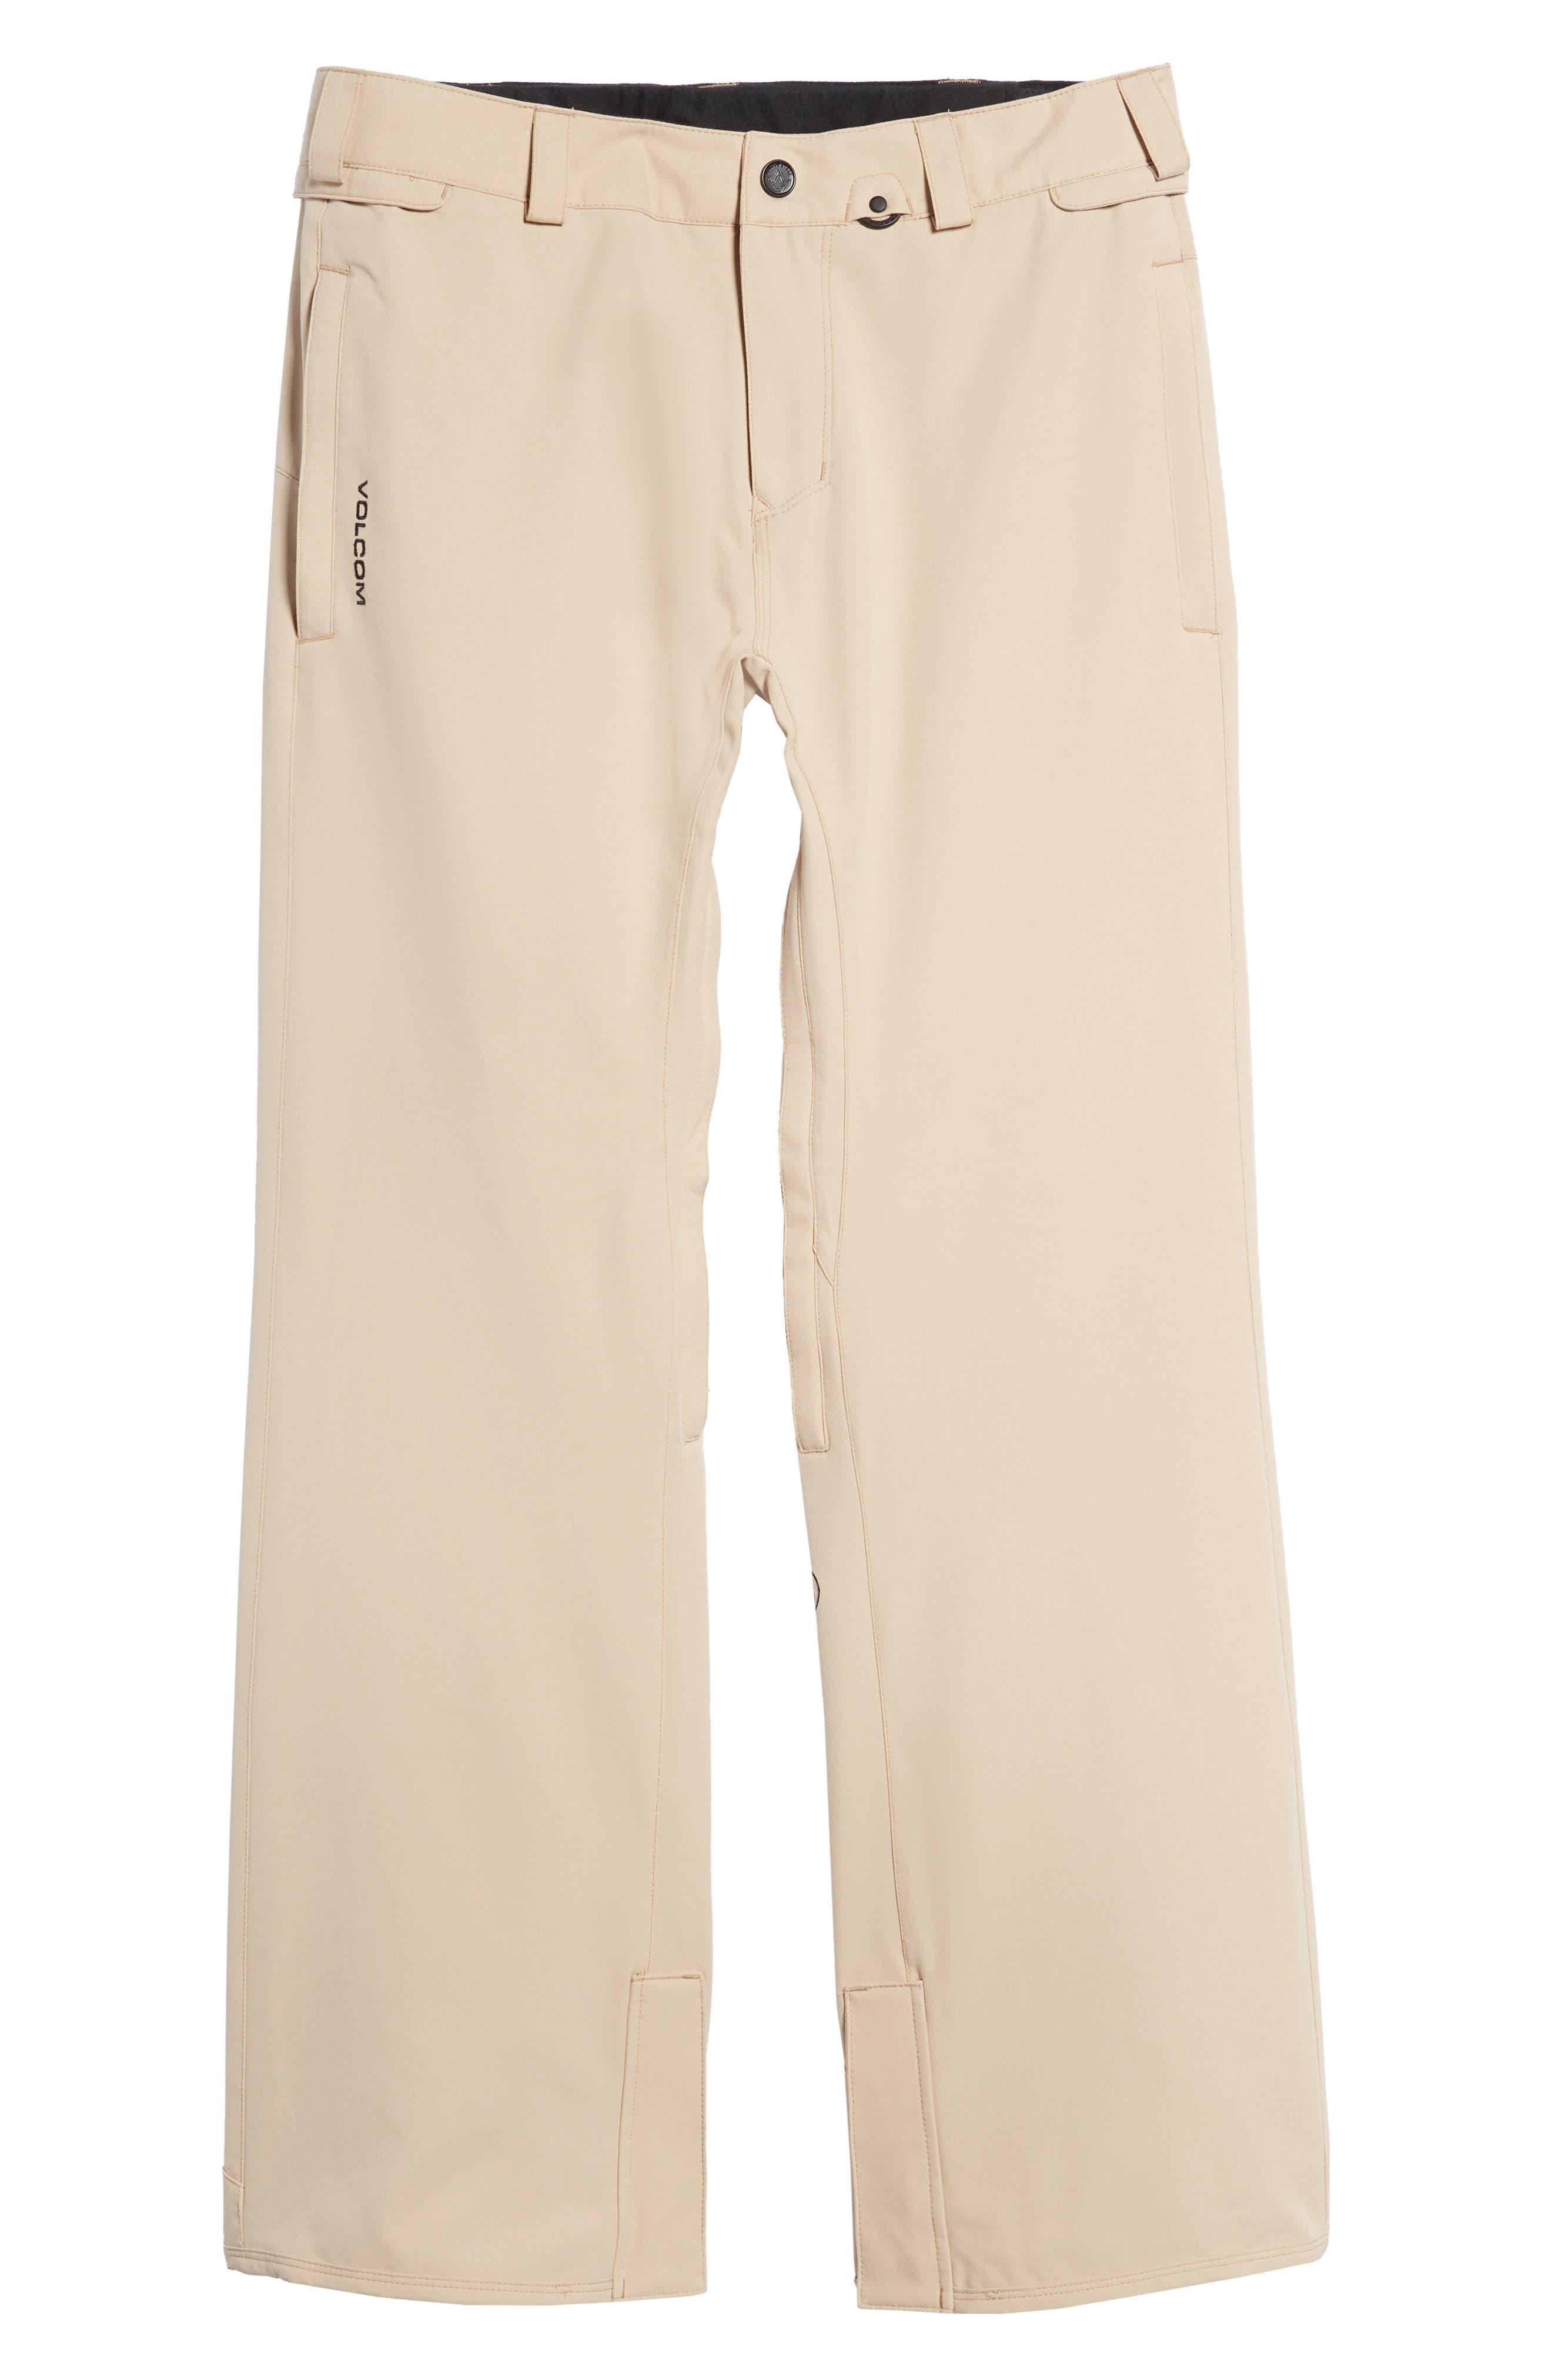 Weatherproof Snow Chino Pants,                             Alternate thumbnail 6, color,                             Khaki